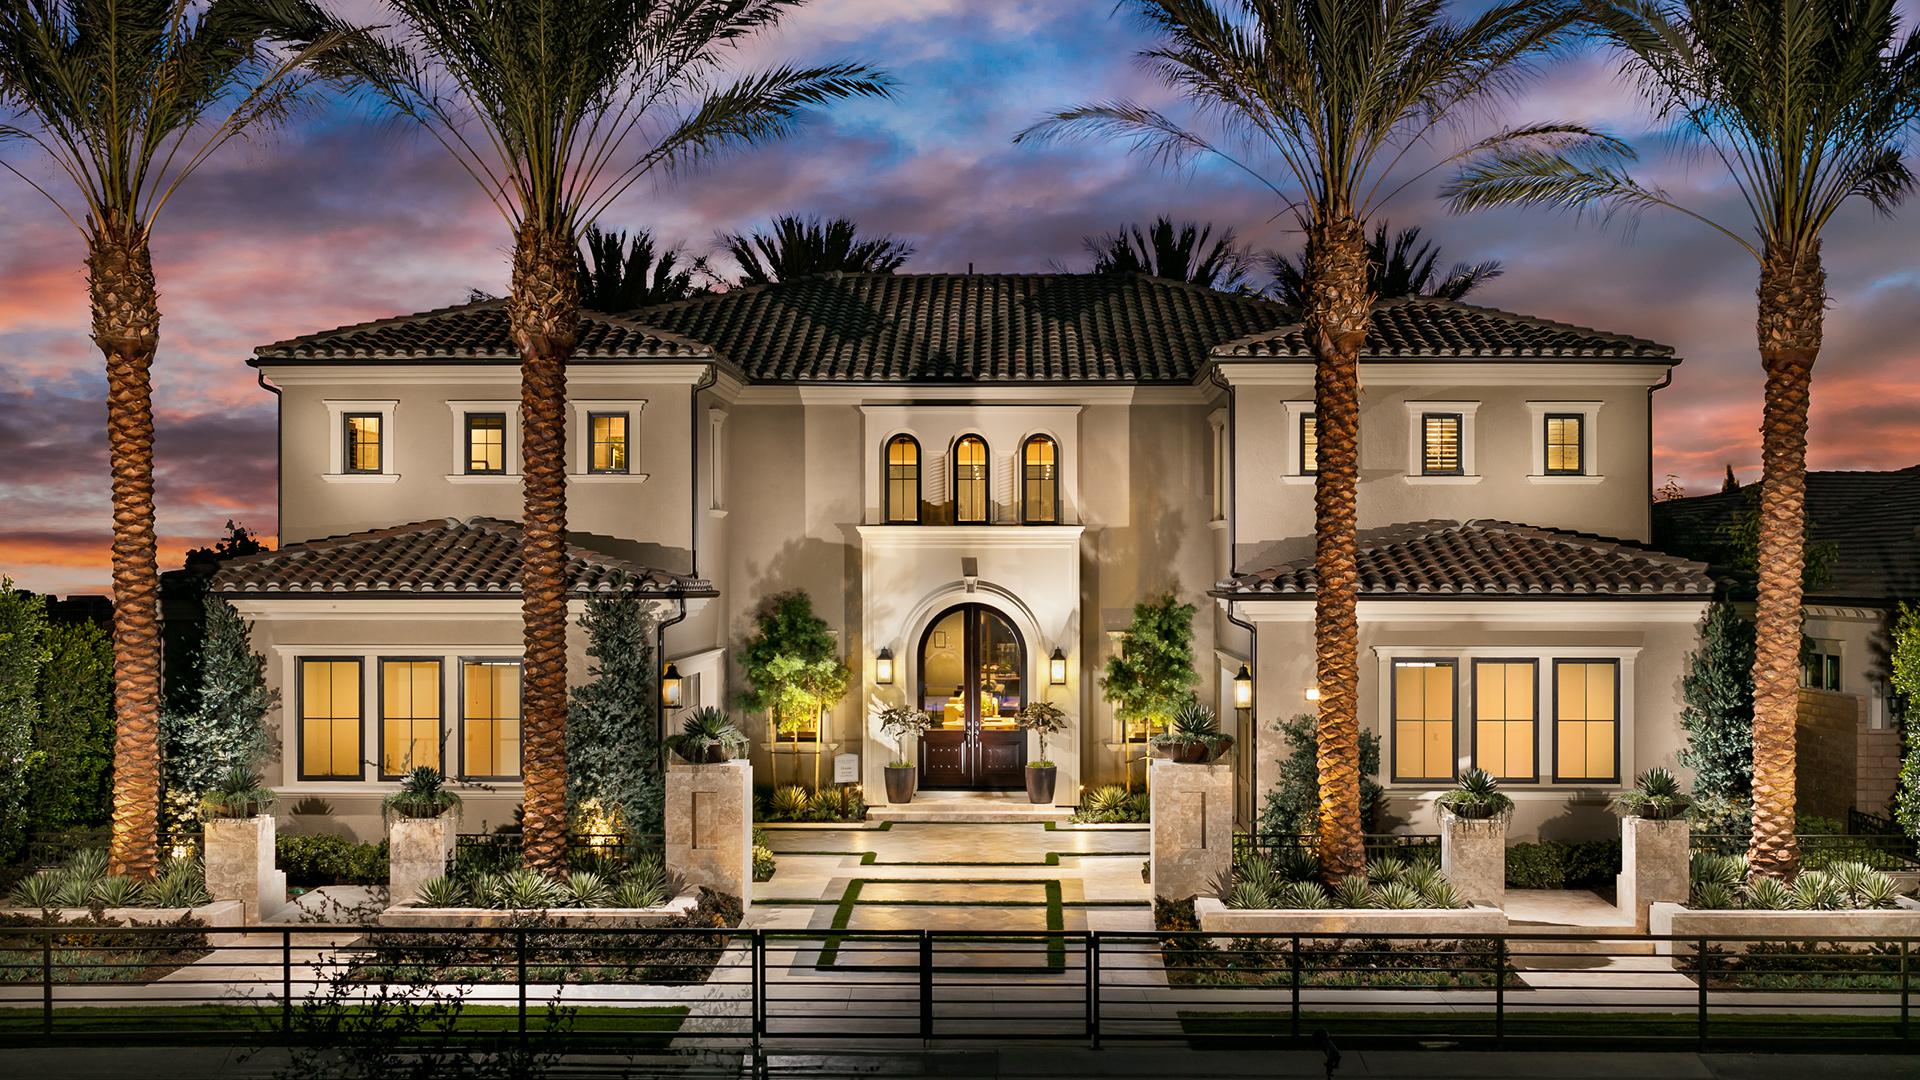 Home Design Ideas Buch: Alta Vista At Orchard Hills